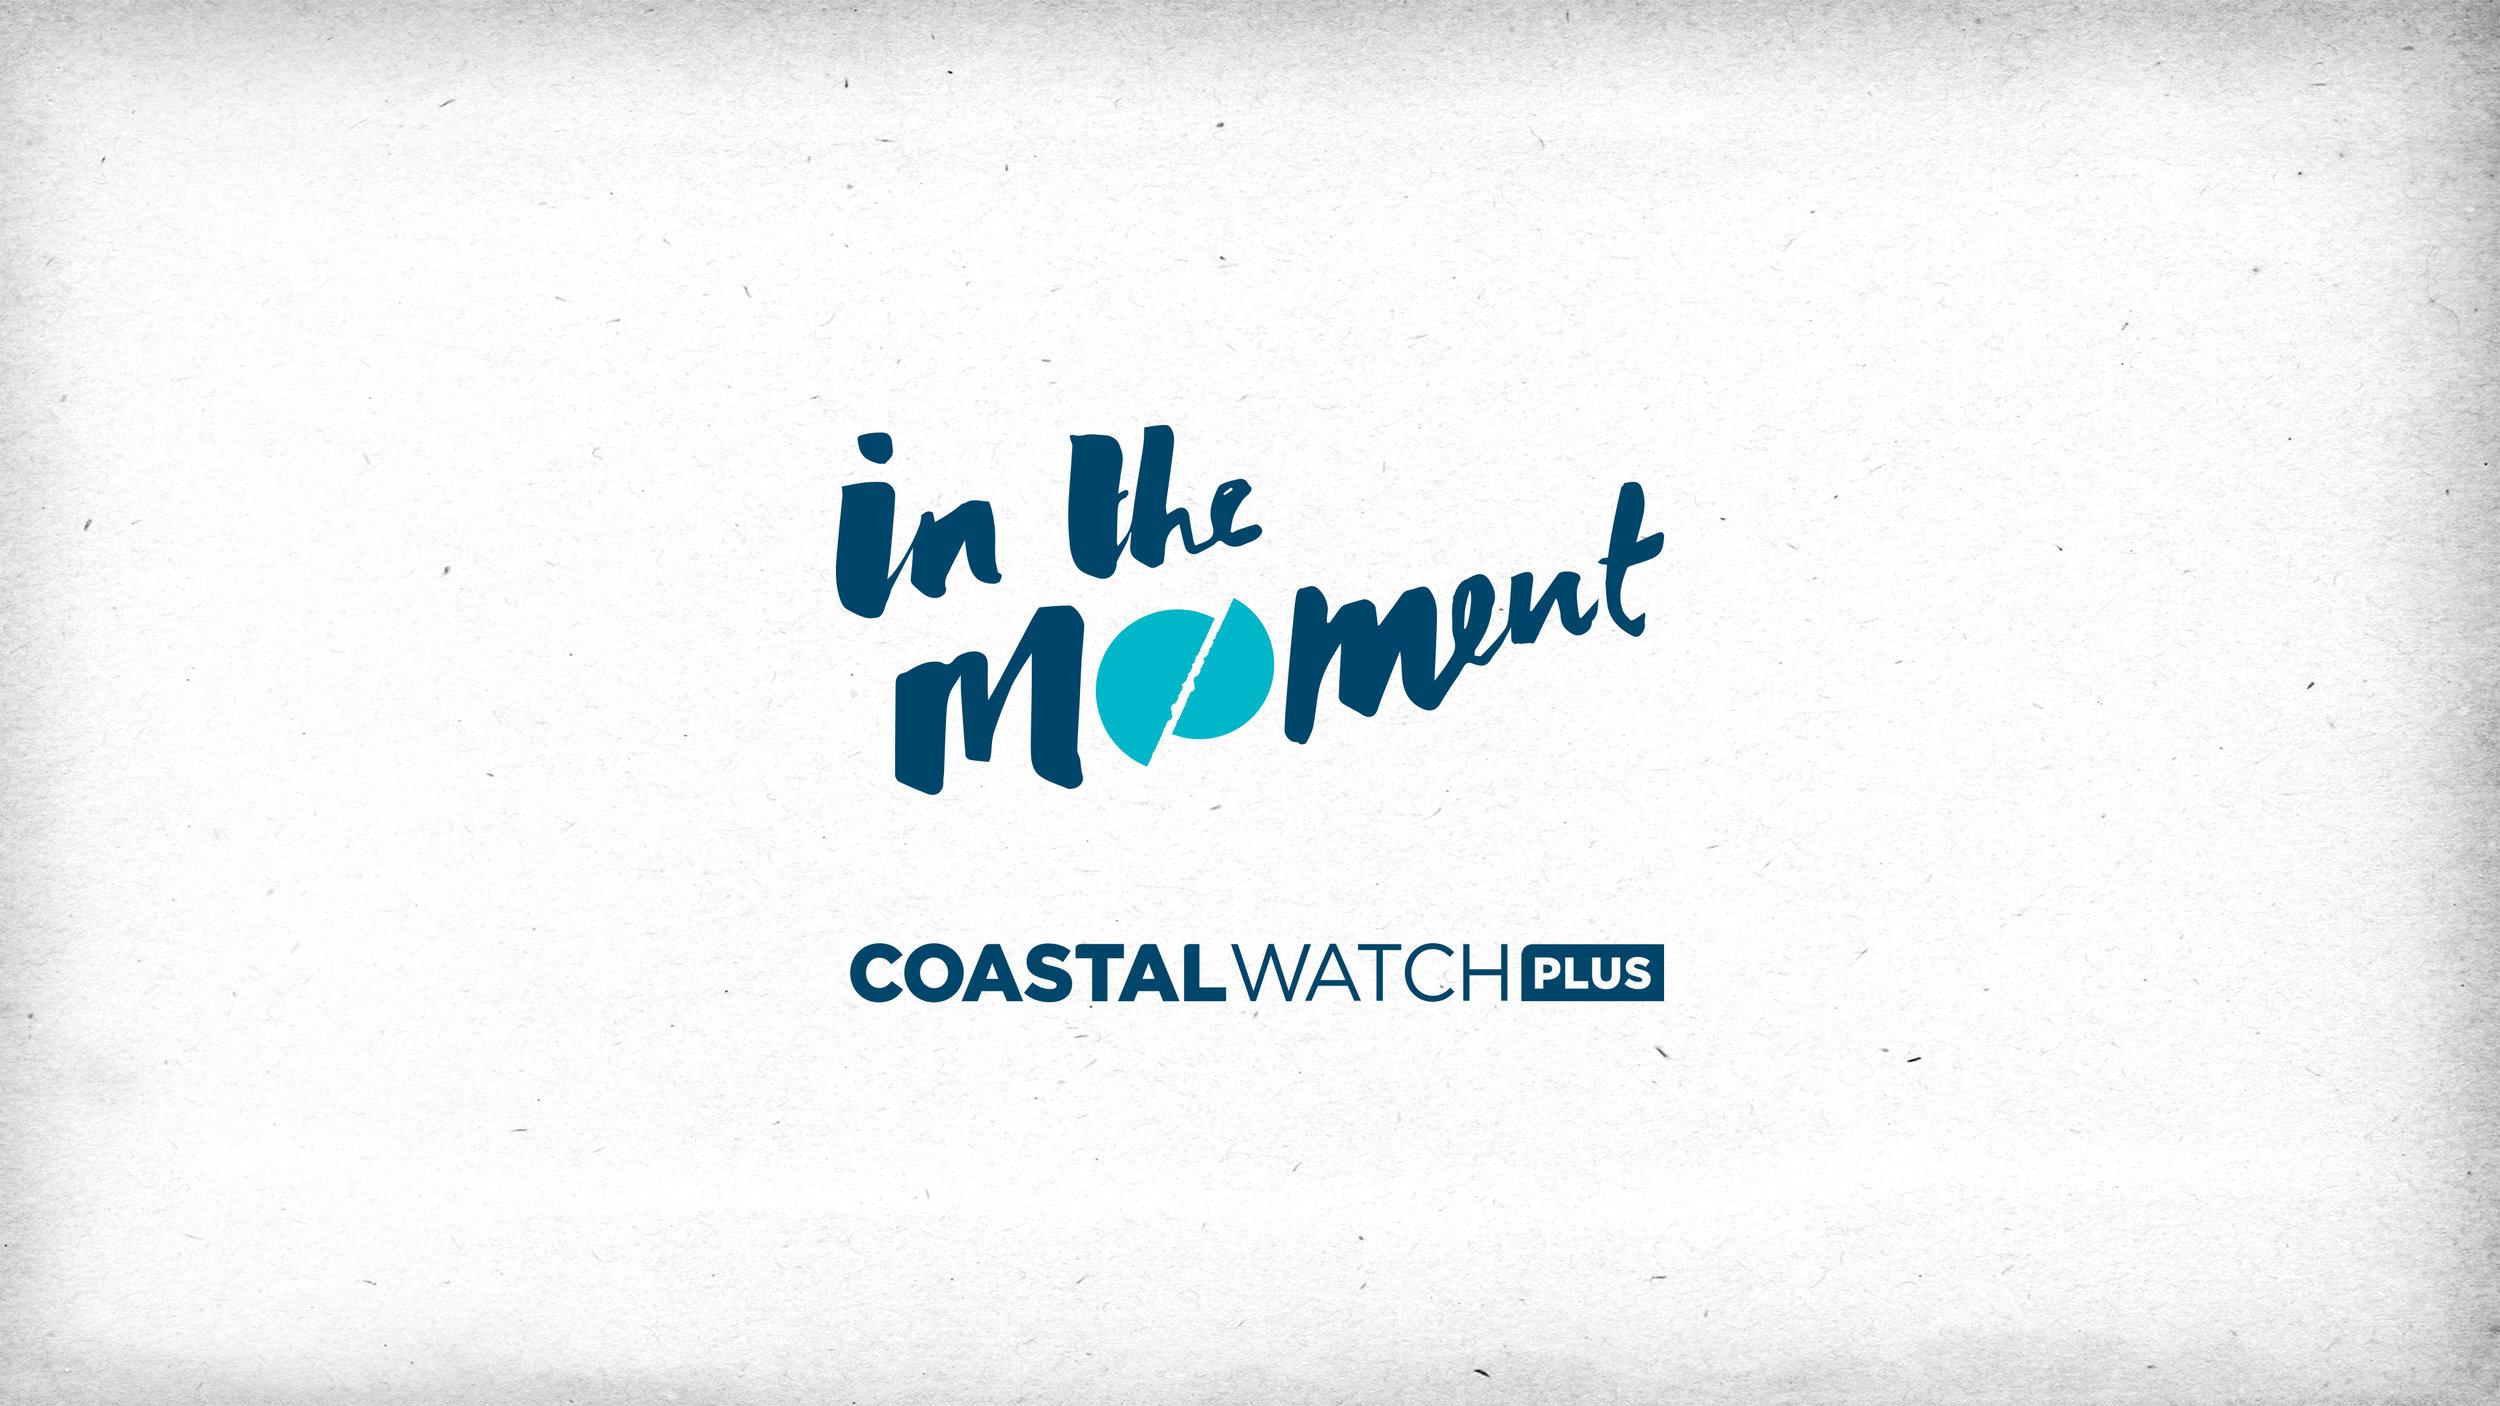 coastalwatch_10.jpg